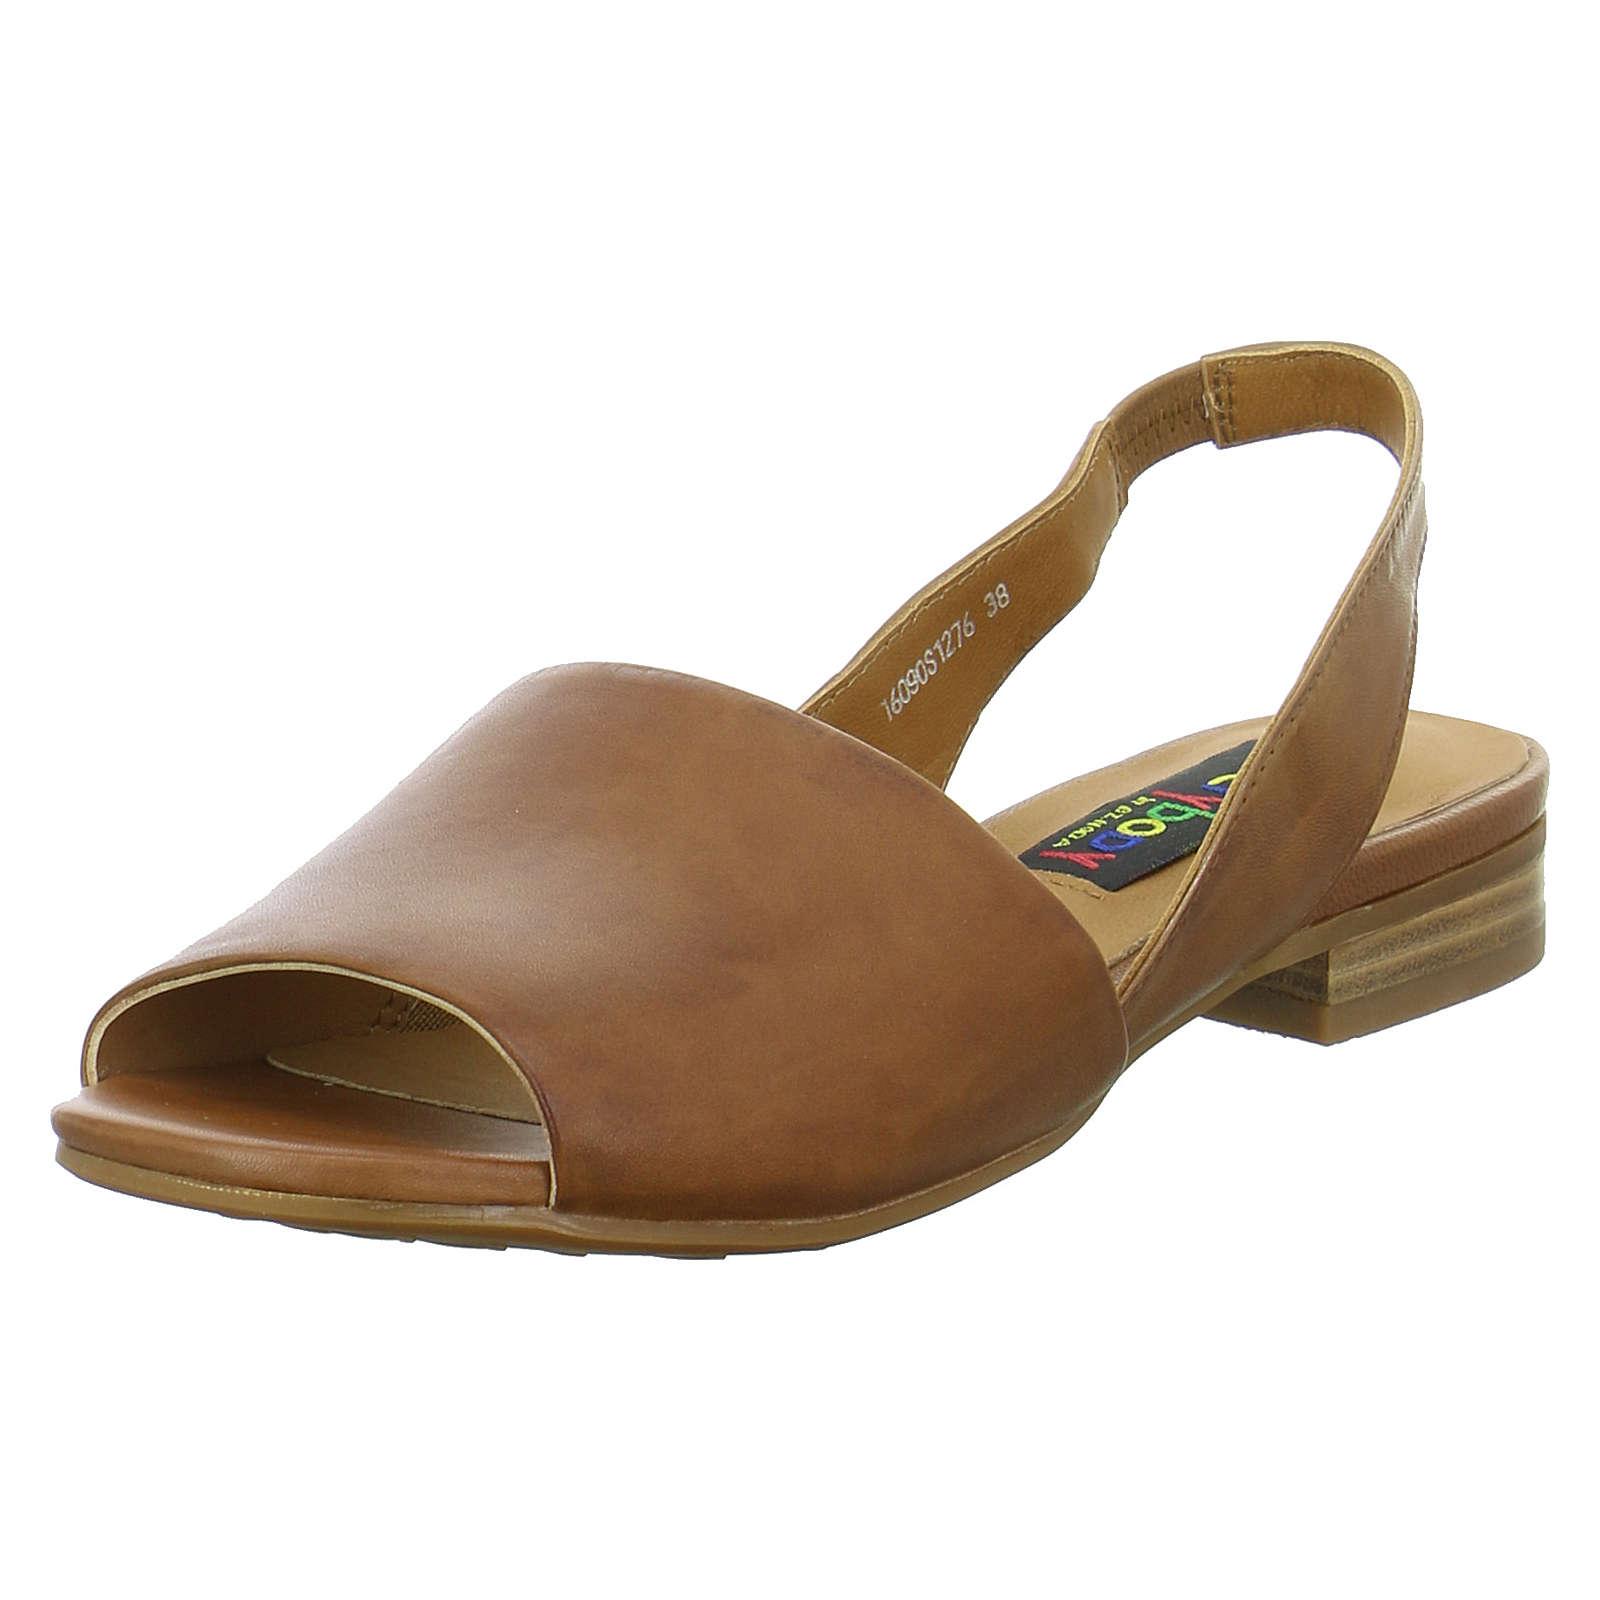 Everybody Sandaletten 16090 Klassische Sandaletten braun Damen Gr. 40